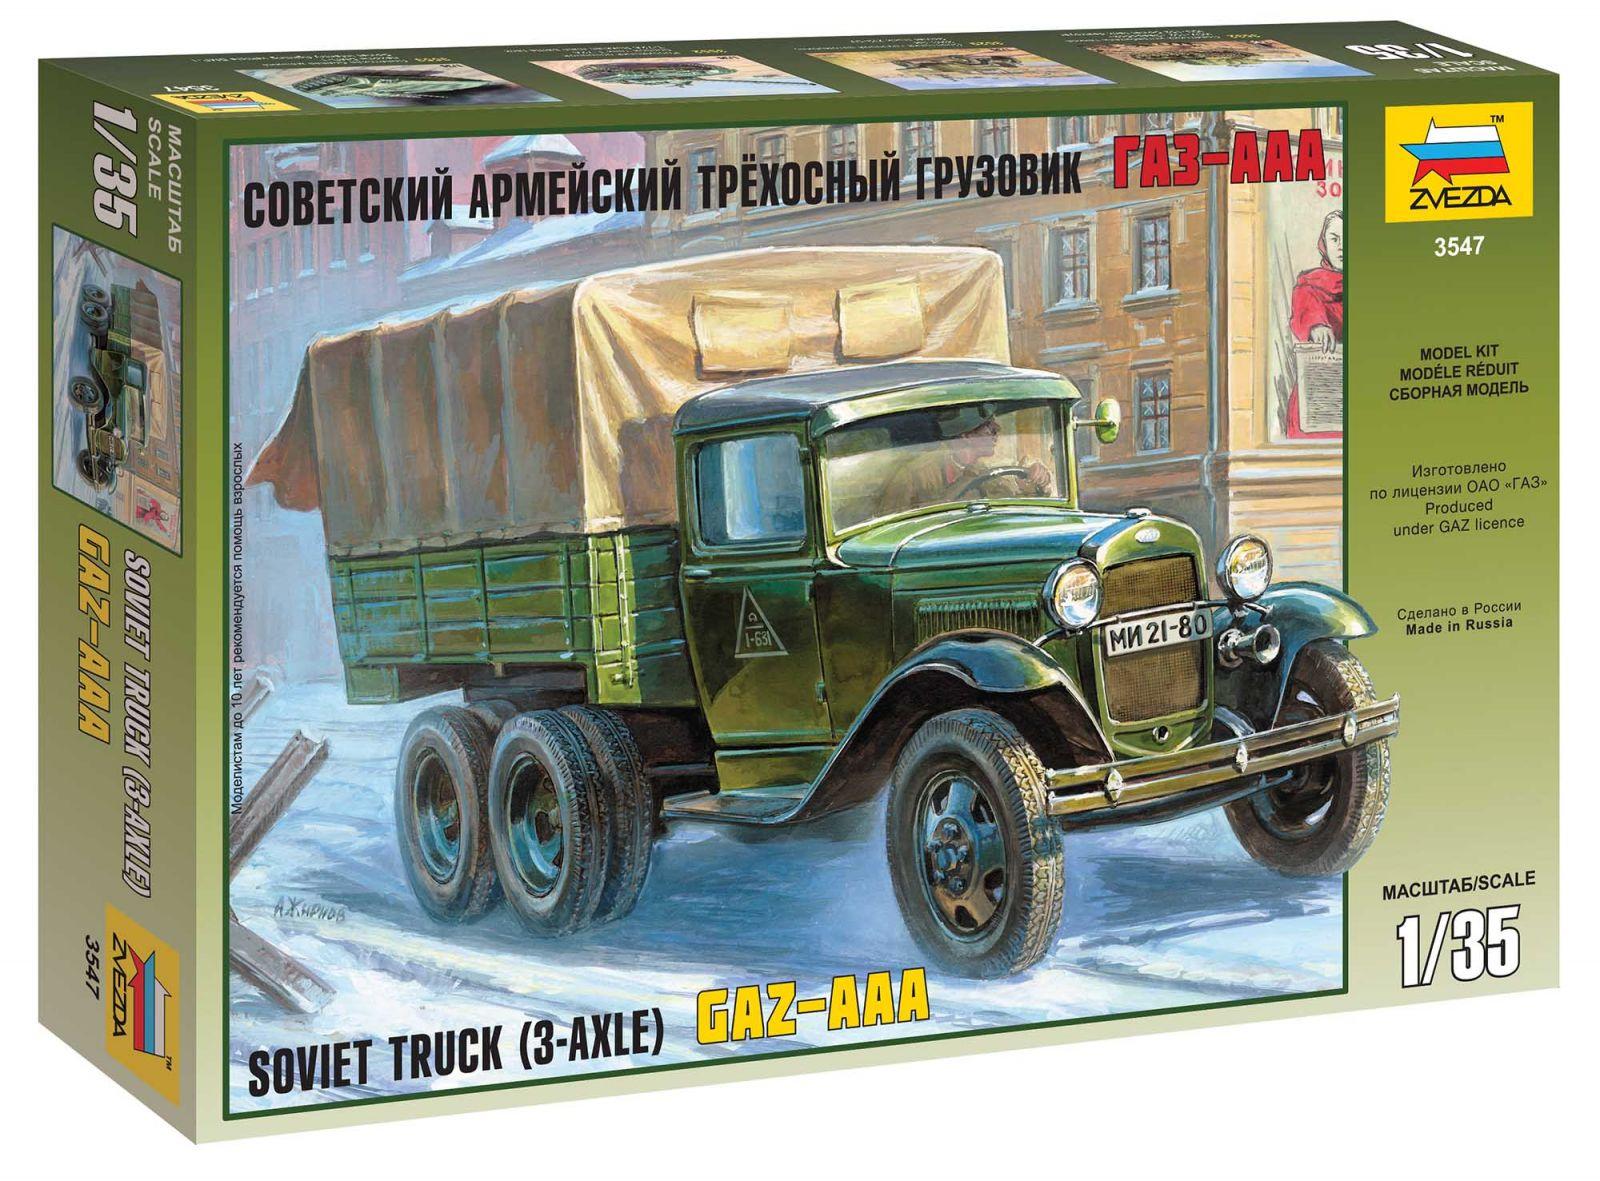 Model Kit military 3547 - GAZ-AAA Soviet Truck (3-axle) (1:35) Plastikové modely